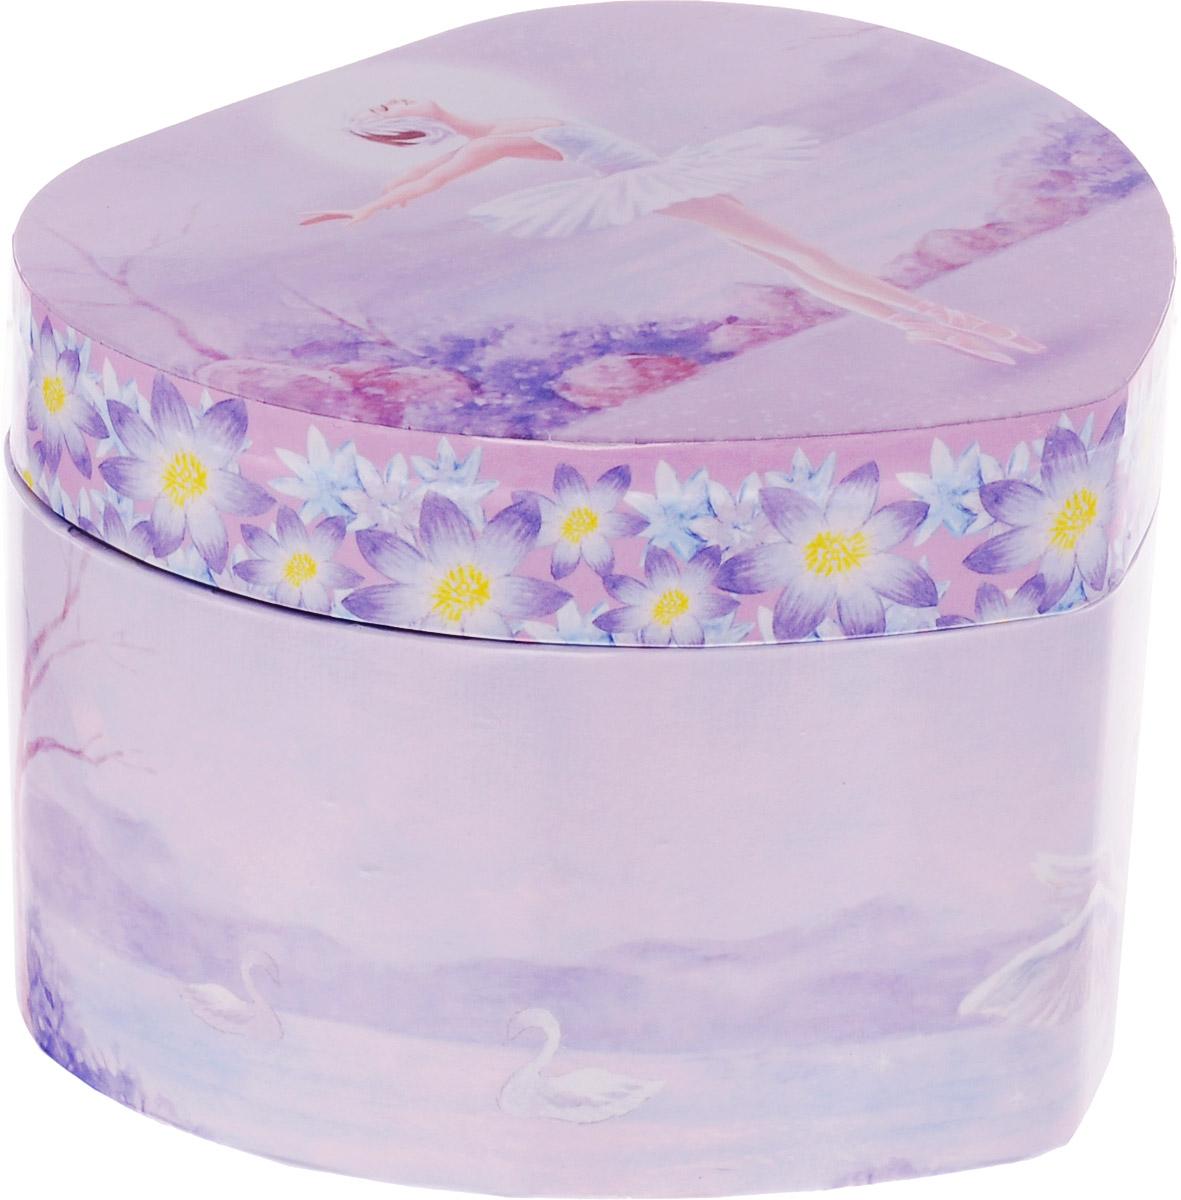 Jakos Музыкальная шкатулка Балерина цвет фиолетовый -  Предметы интерьера